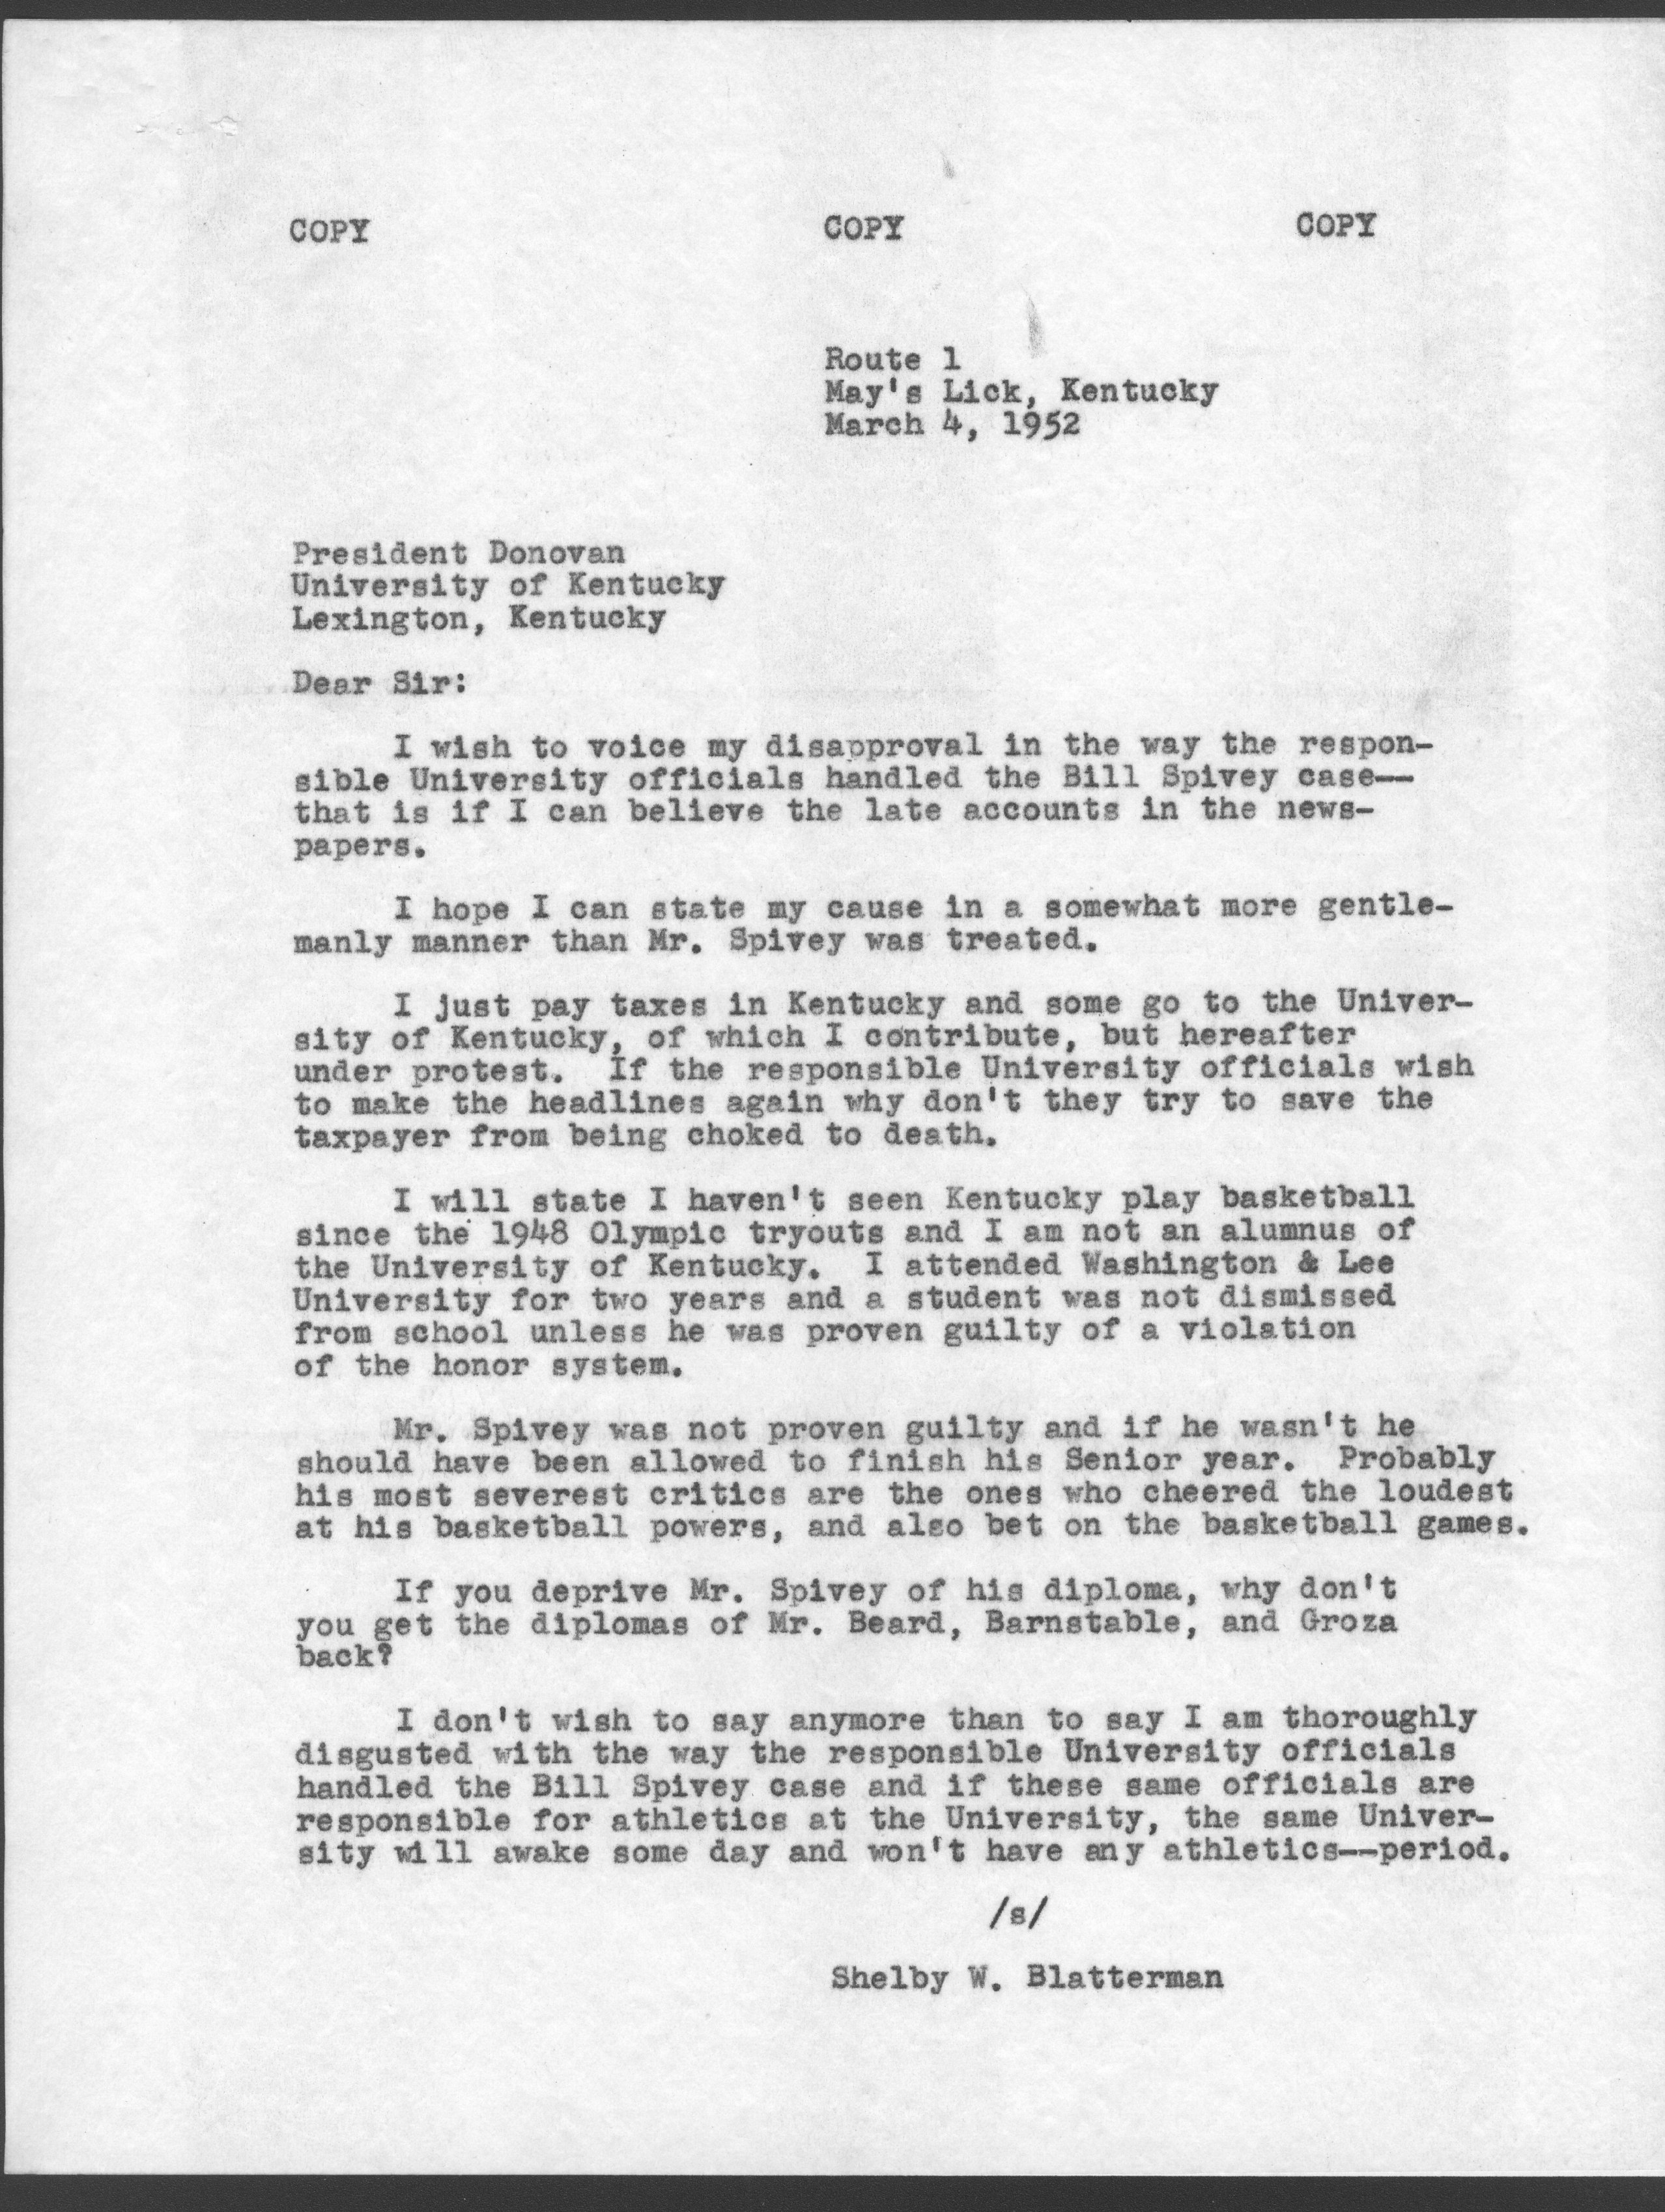 Letter from Shelby Blatterman to Herman Donovan expressing – Disagreement Letter